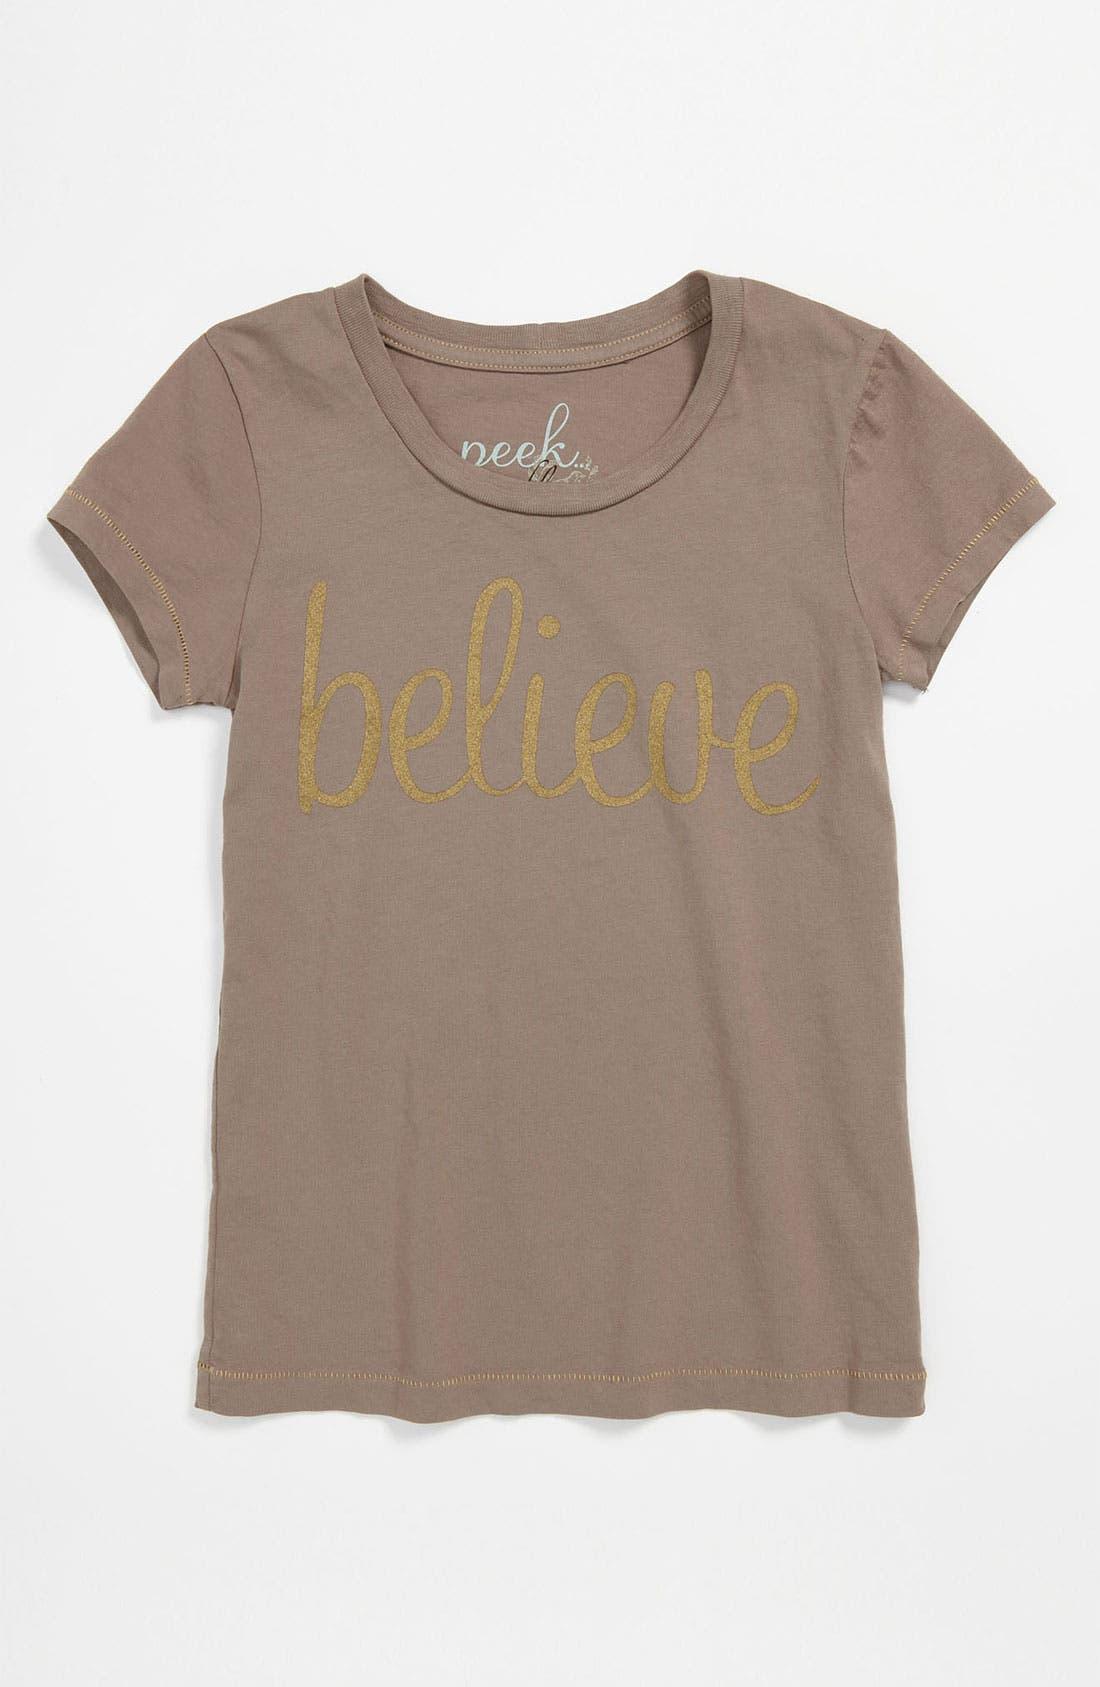 Alternate Image 1 Selected - Peek 'Believe' Tee (Toddler, Little Girls & Big Girls)